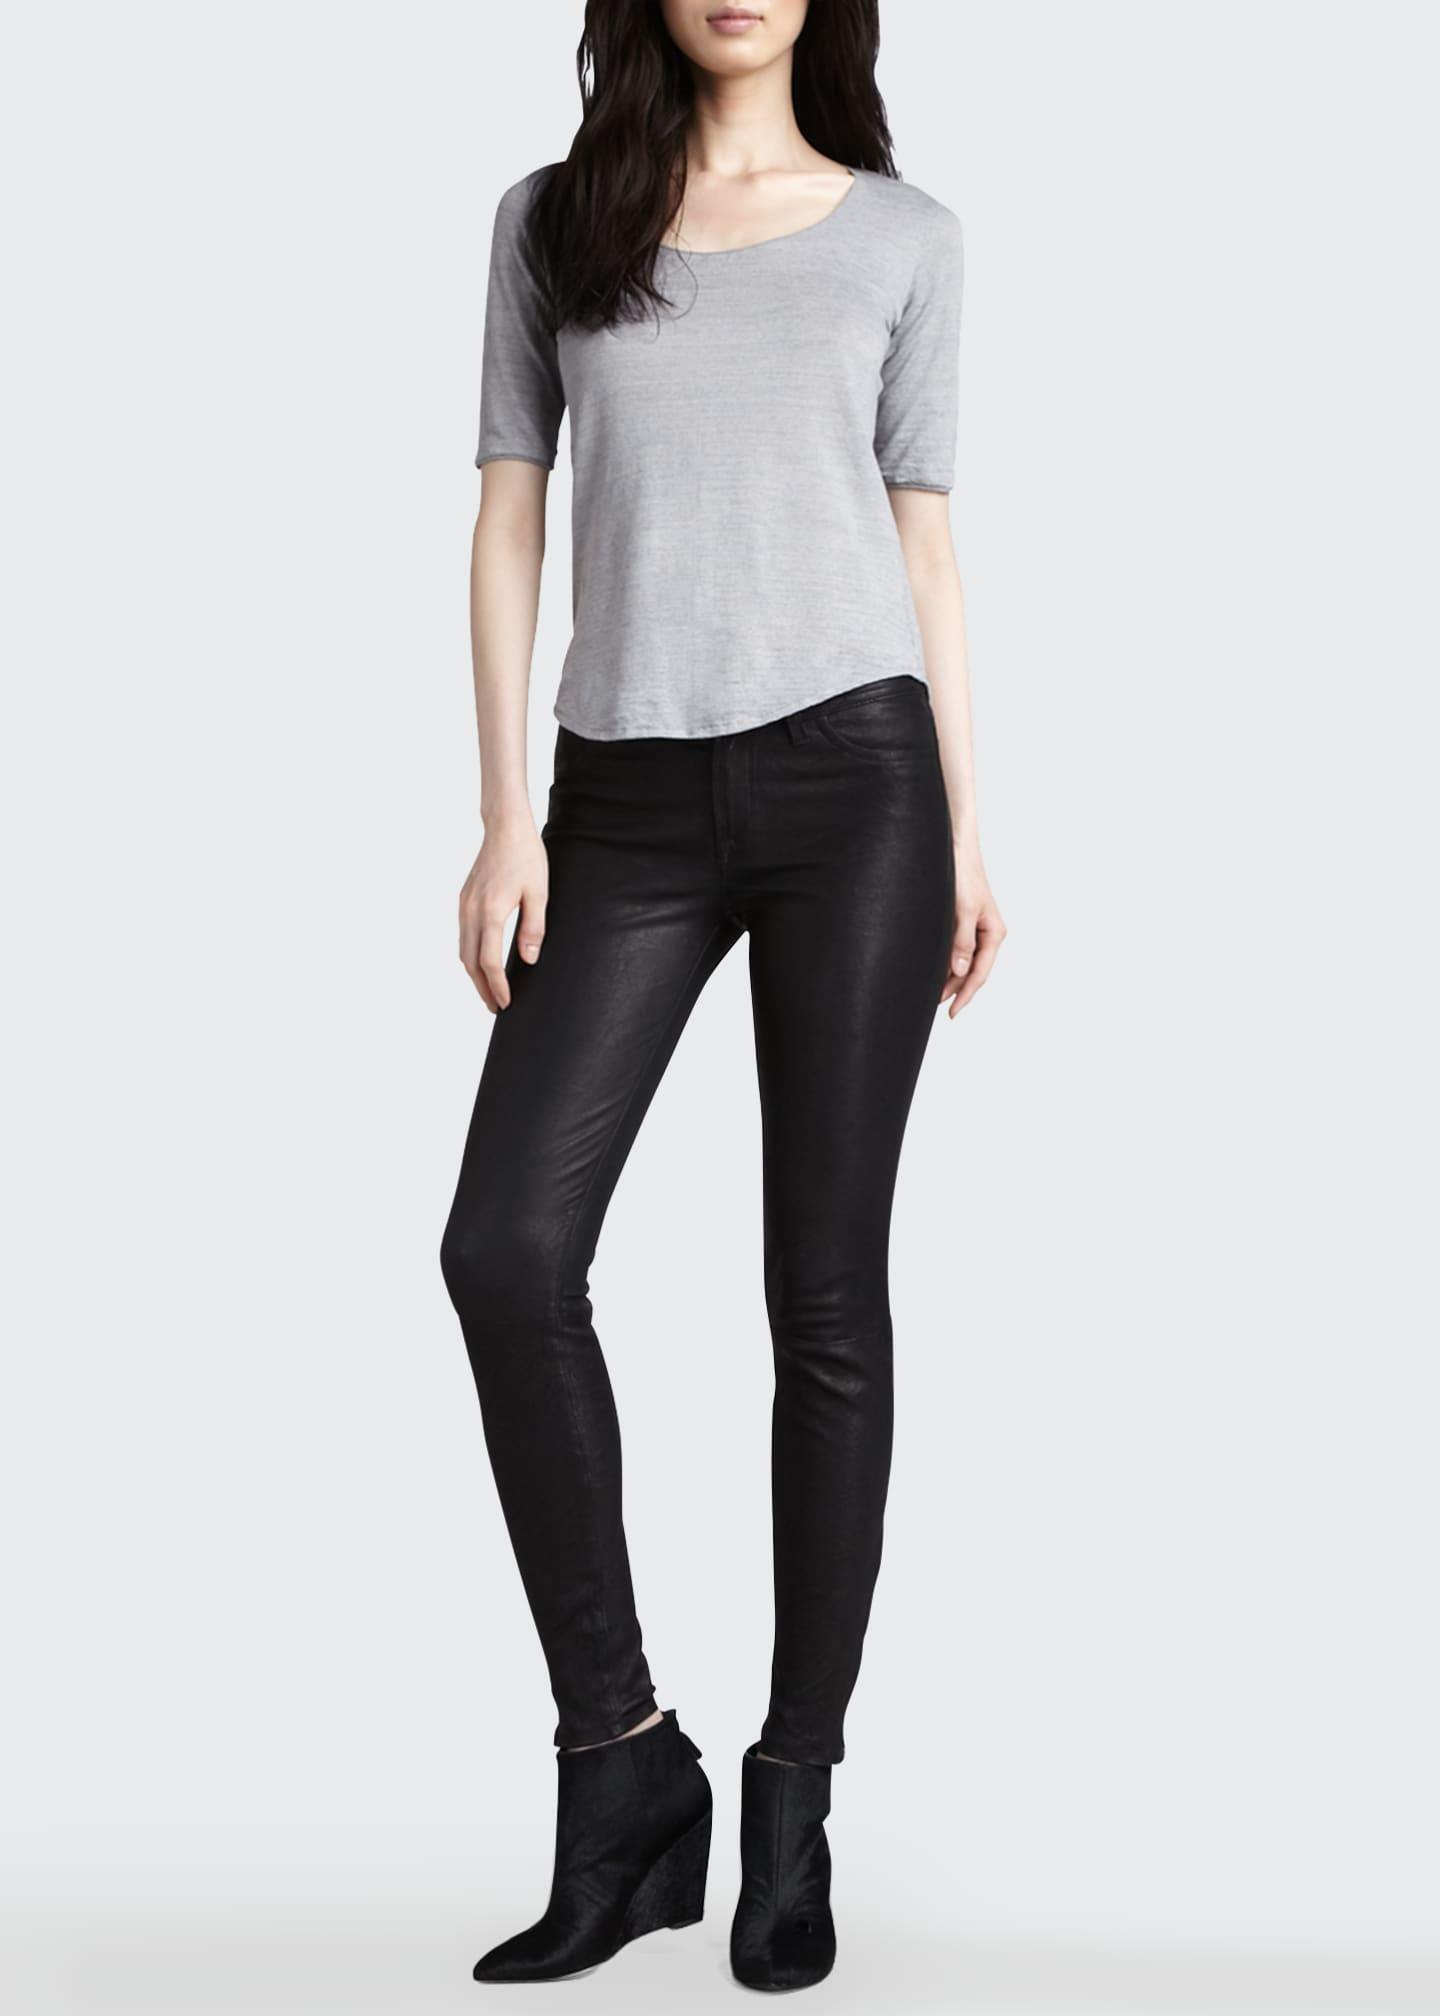 J Brand Leather Super Skinny Pants, Noir